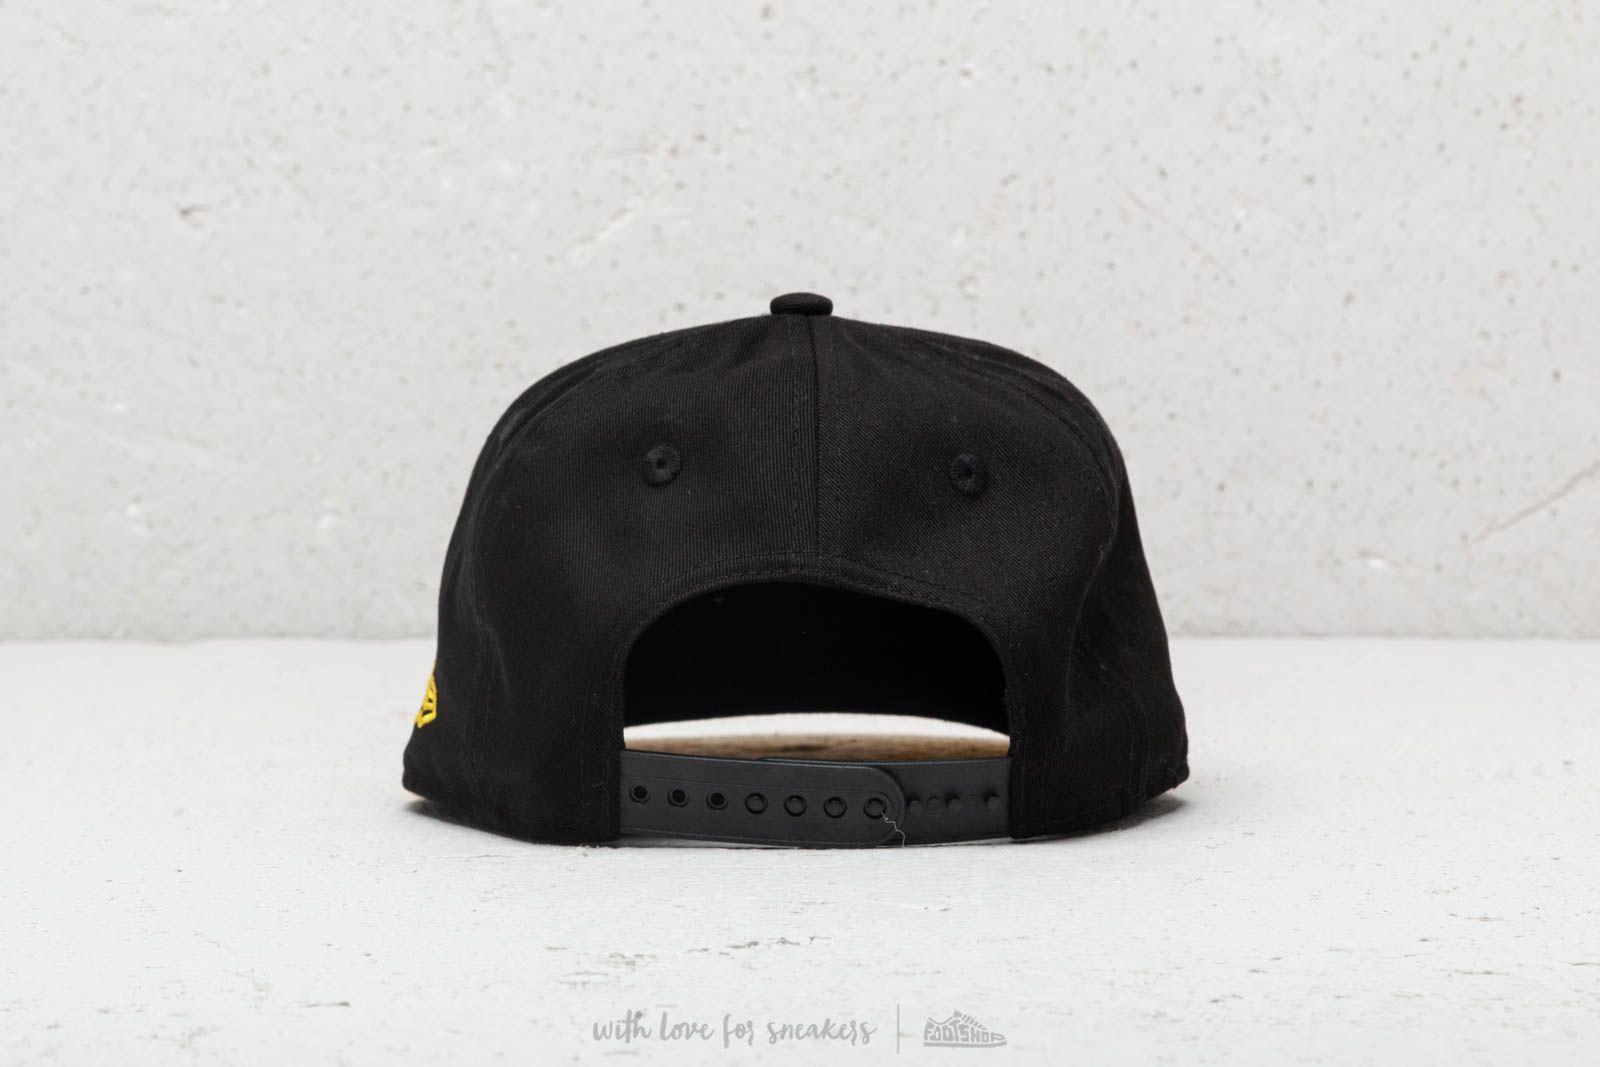 297074a28c7d5 New Era Kids Essential Batman Snapback Black  Yellow at a great price 26 €  buy